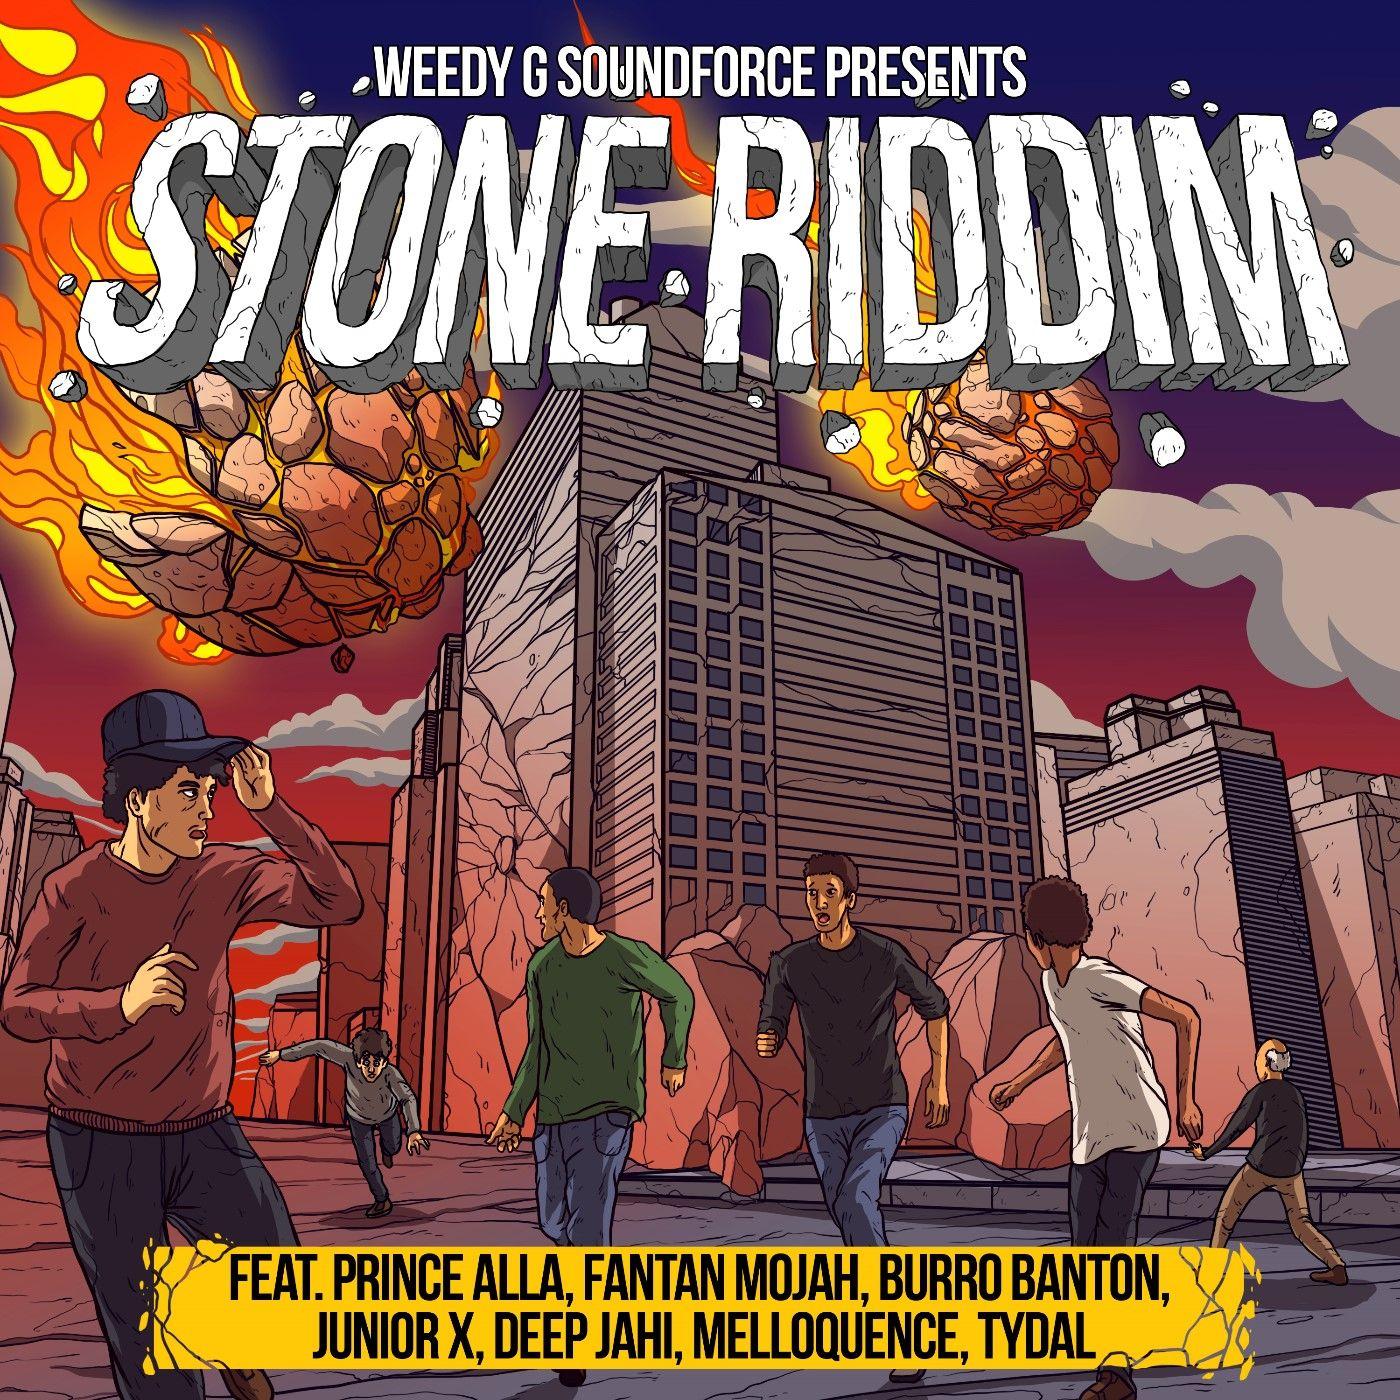 Stone Riddim Weedy G Soundforce Download The Latest Reggae Dancehall Reggae Comic Book Cover Stone